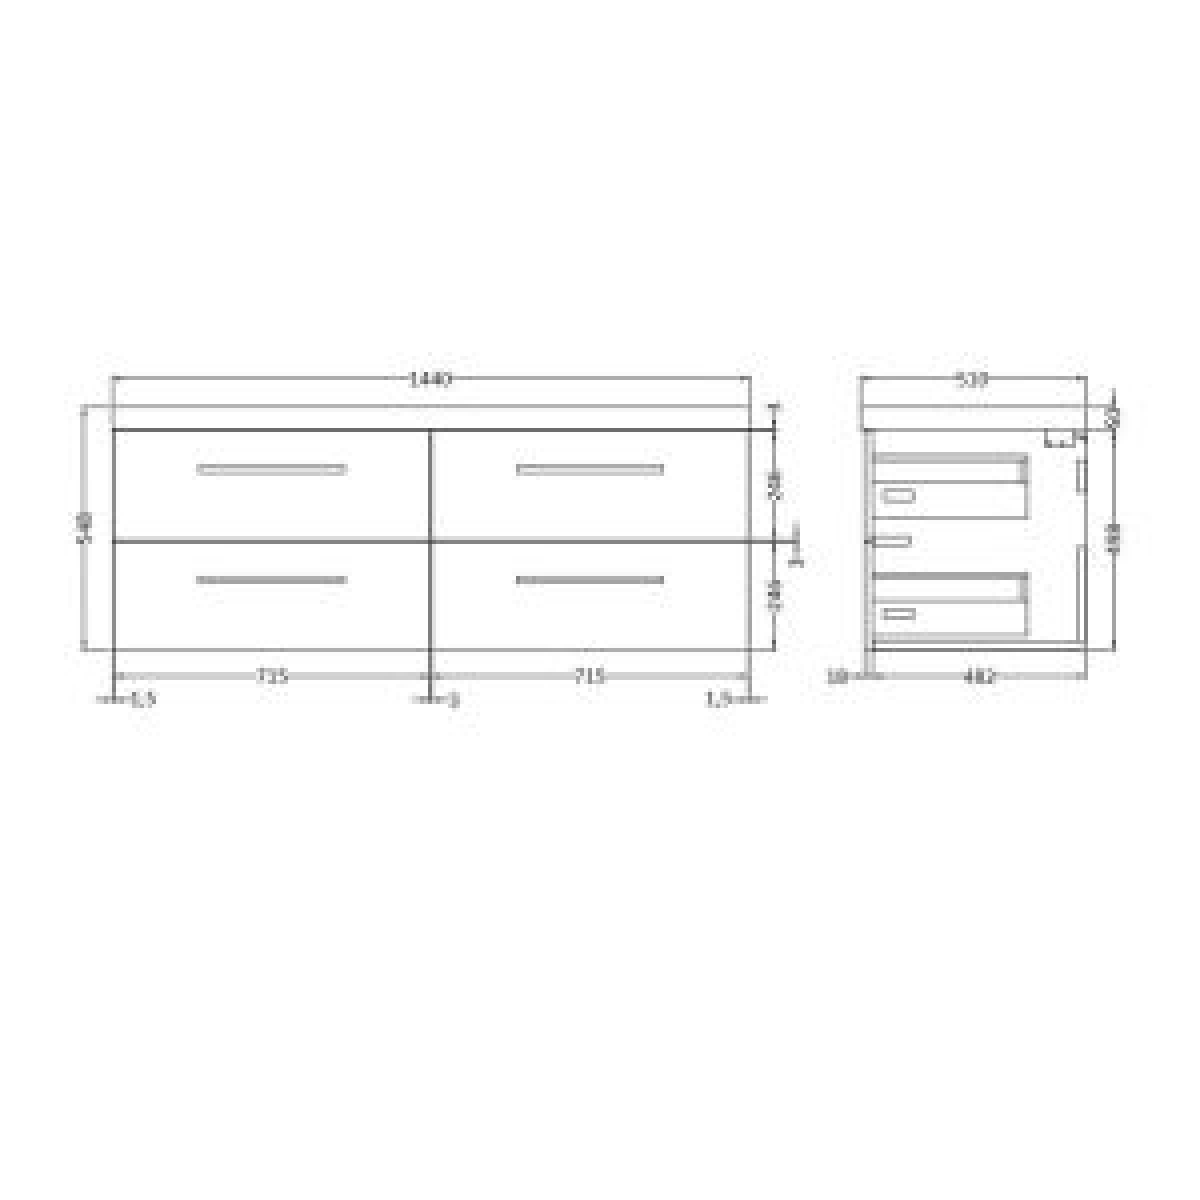 Hudson Reed Quartet Double Vanity Unit 1440mm line drawing